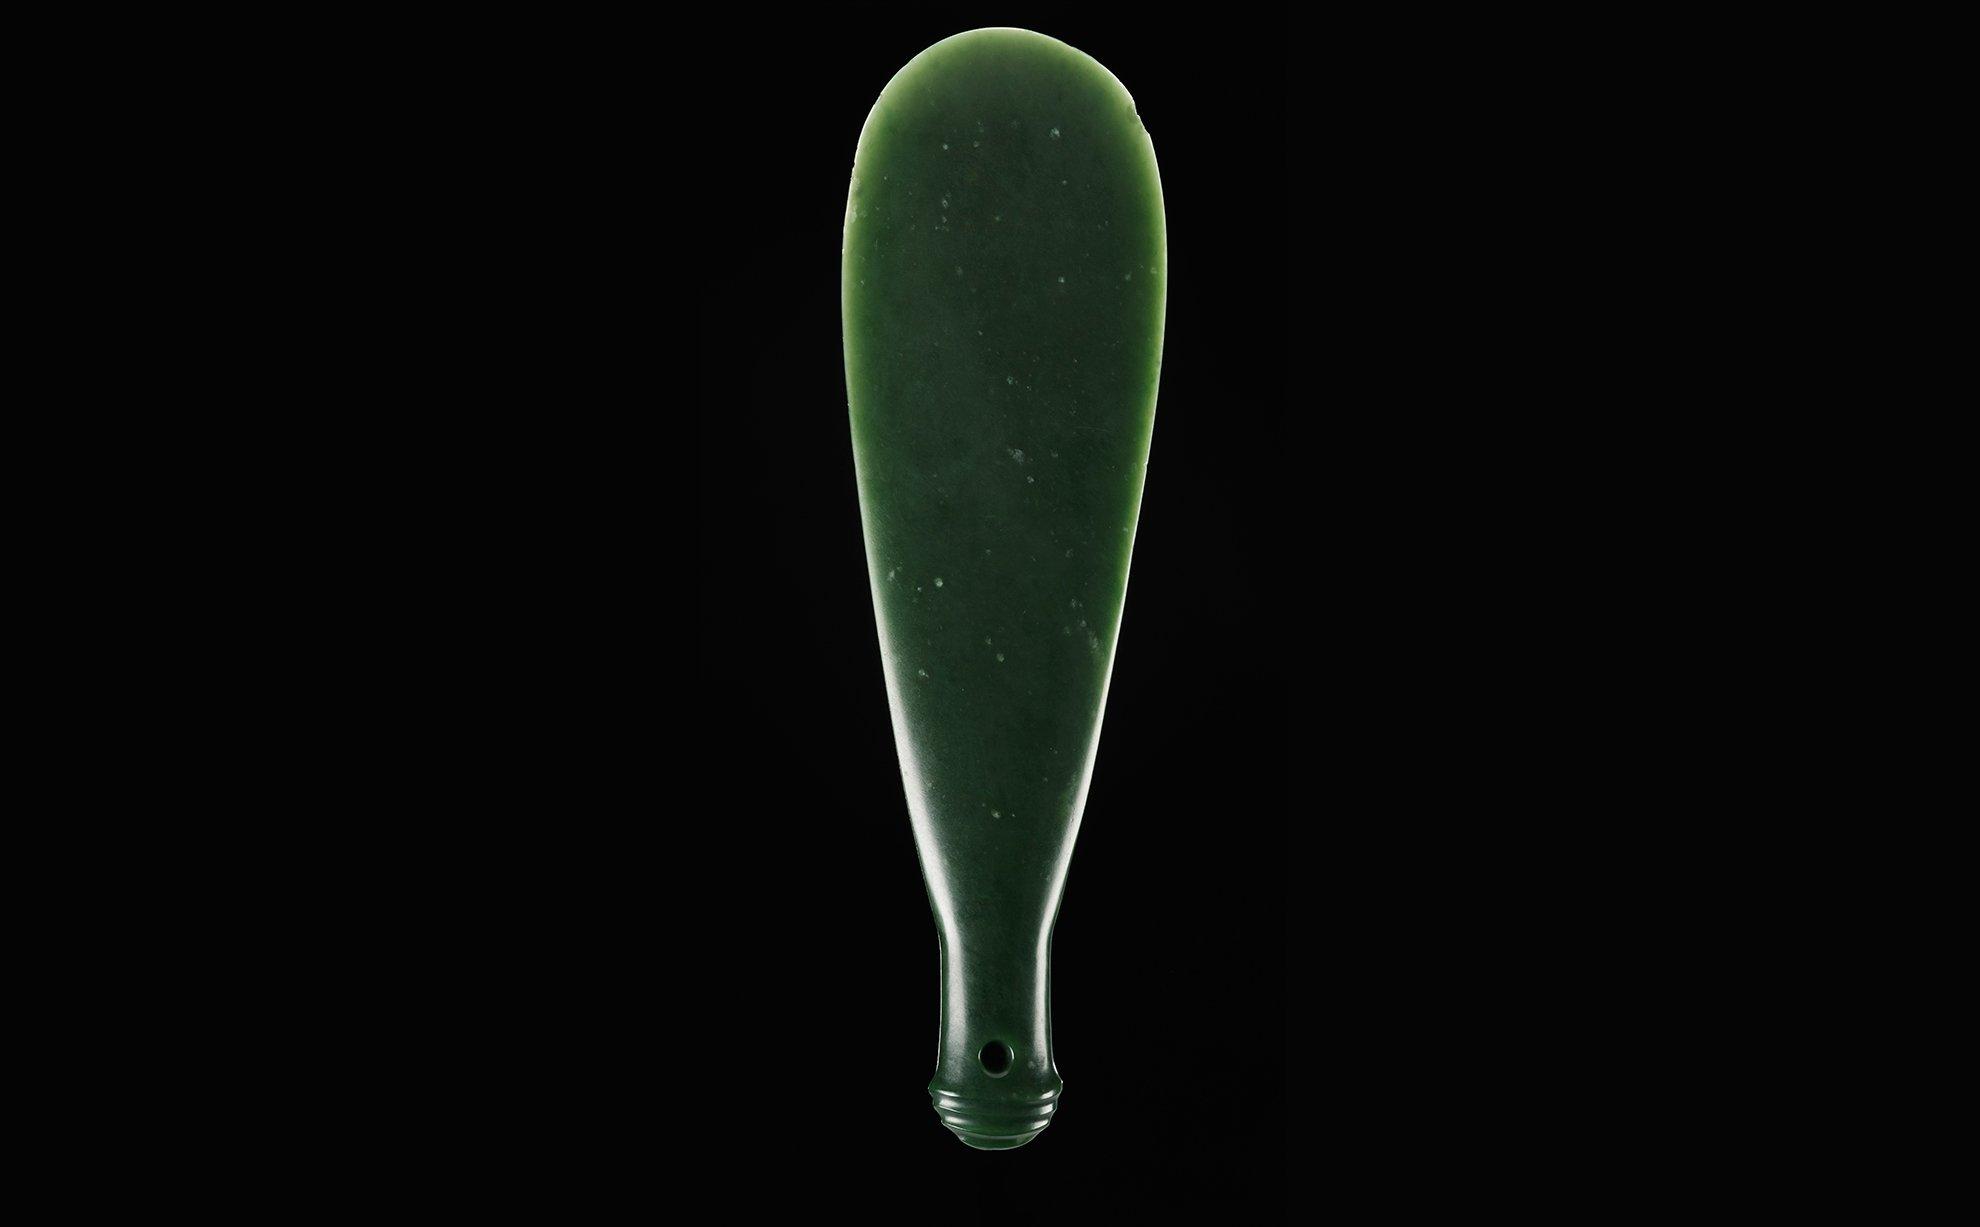 Tuhiwai mere pounamu nephrite weapon 1500_1800 Otago maker unknown Gift of the Wineera family